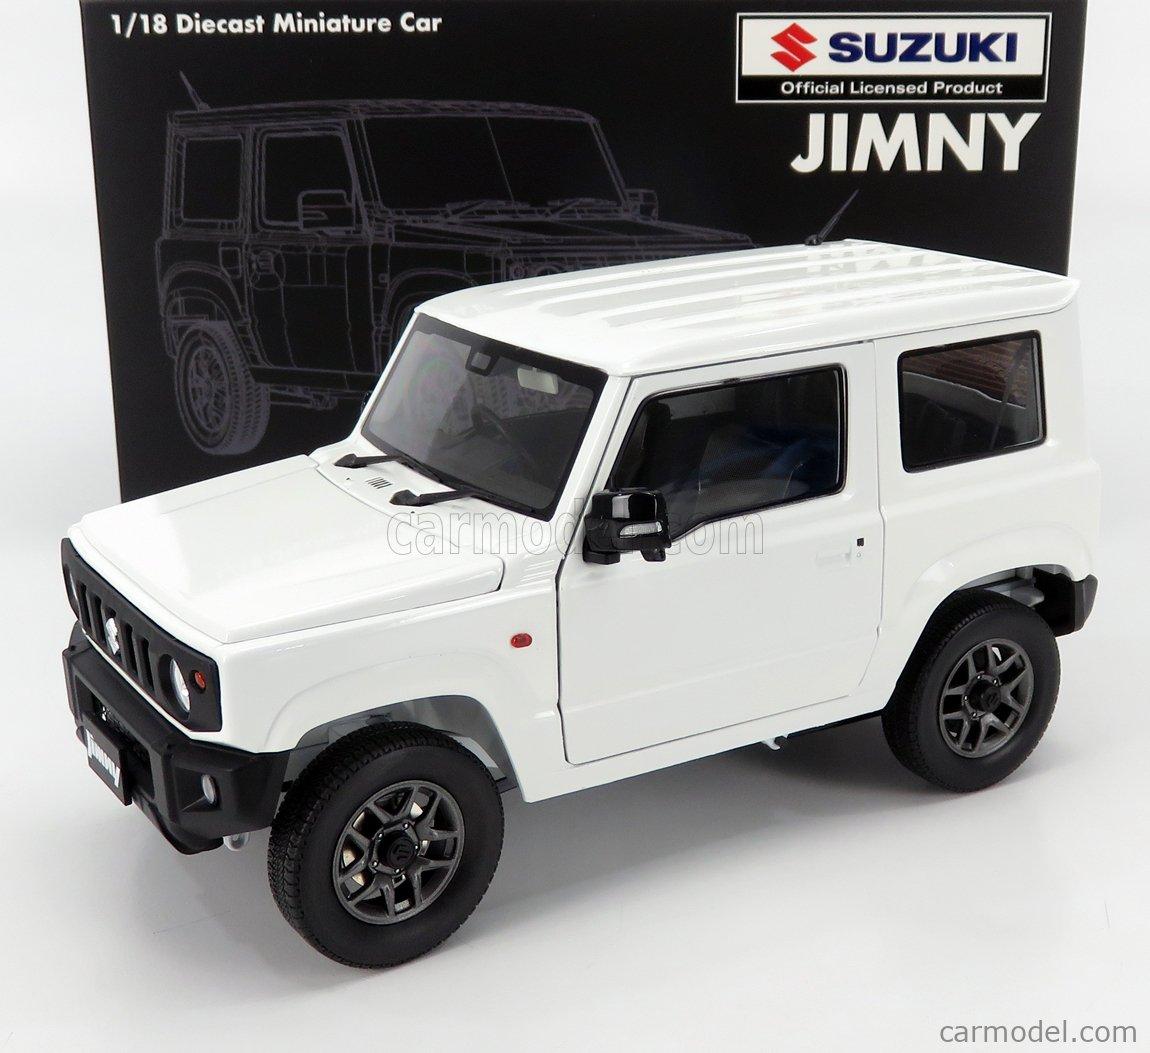 BM-CREATIONS BM18B0017 Scale 1/18  SUZUKI JIMNY JB64 LHD 2018 WHITE